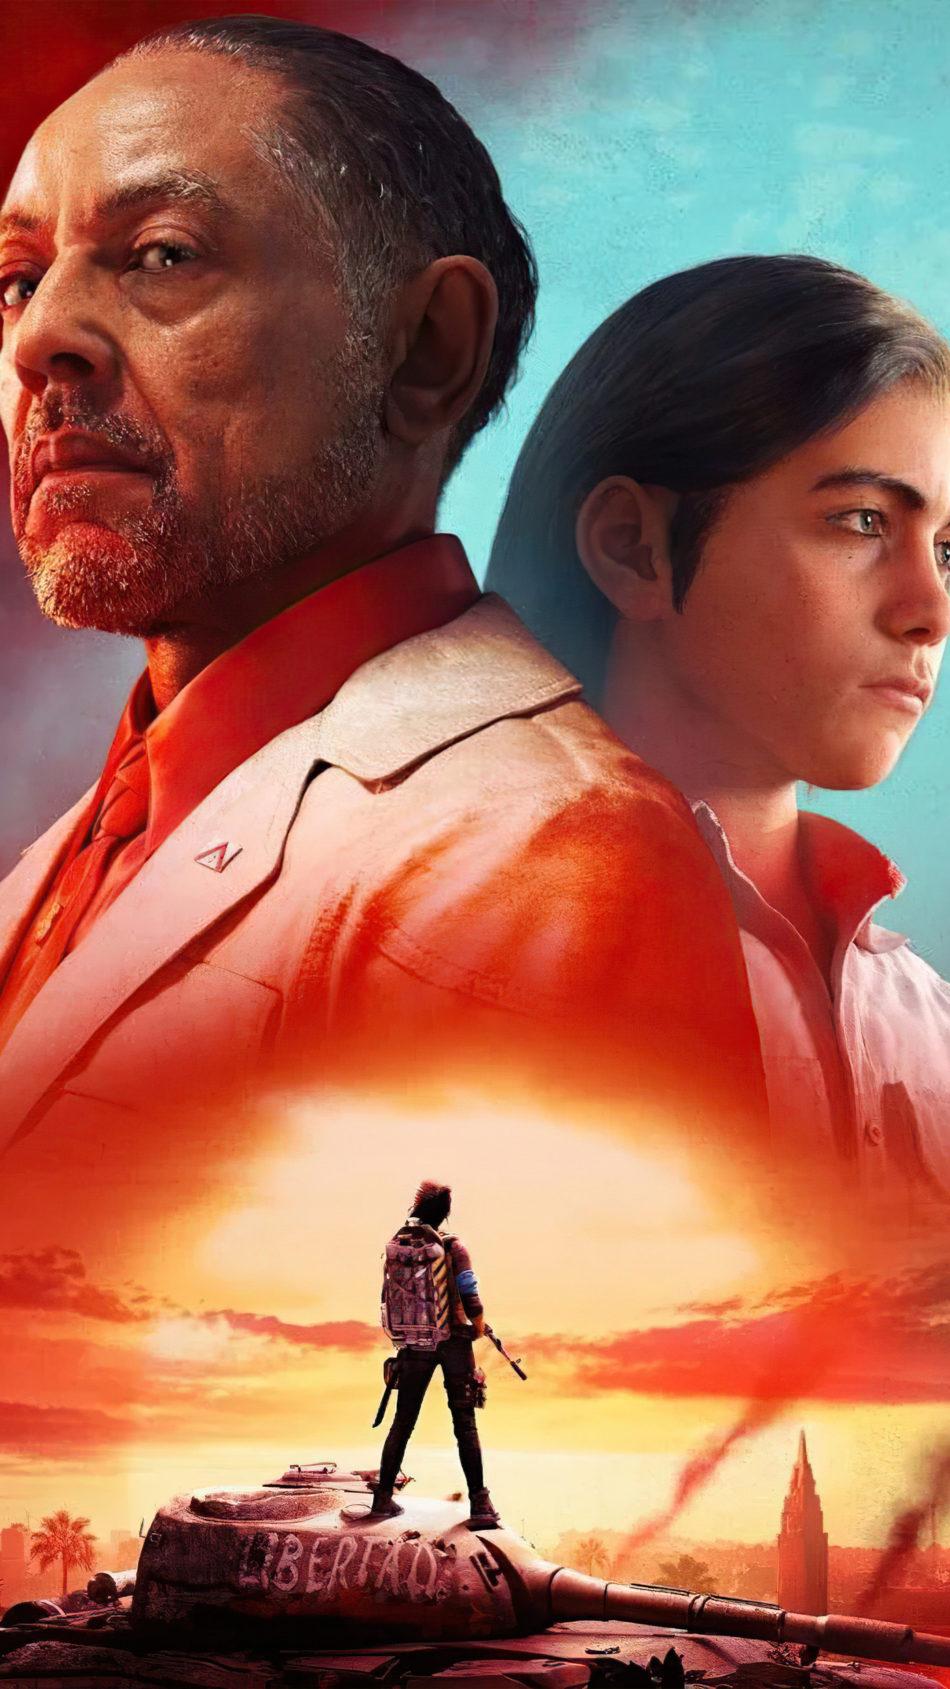 Far Cry 6 Poster 2021 4K Ultra HD Mobile Wallpaper